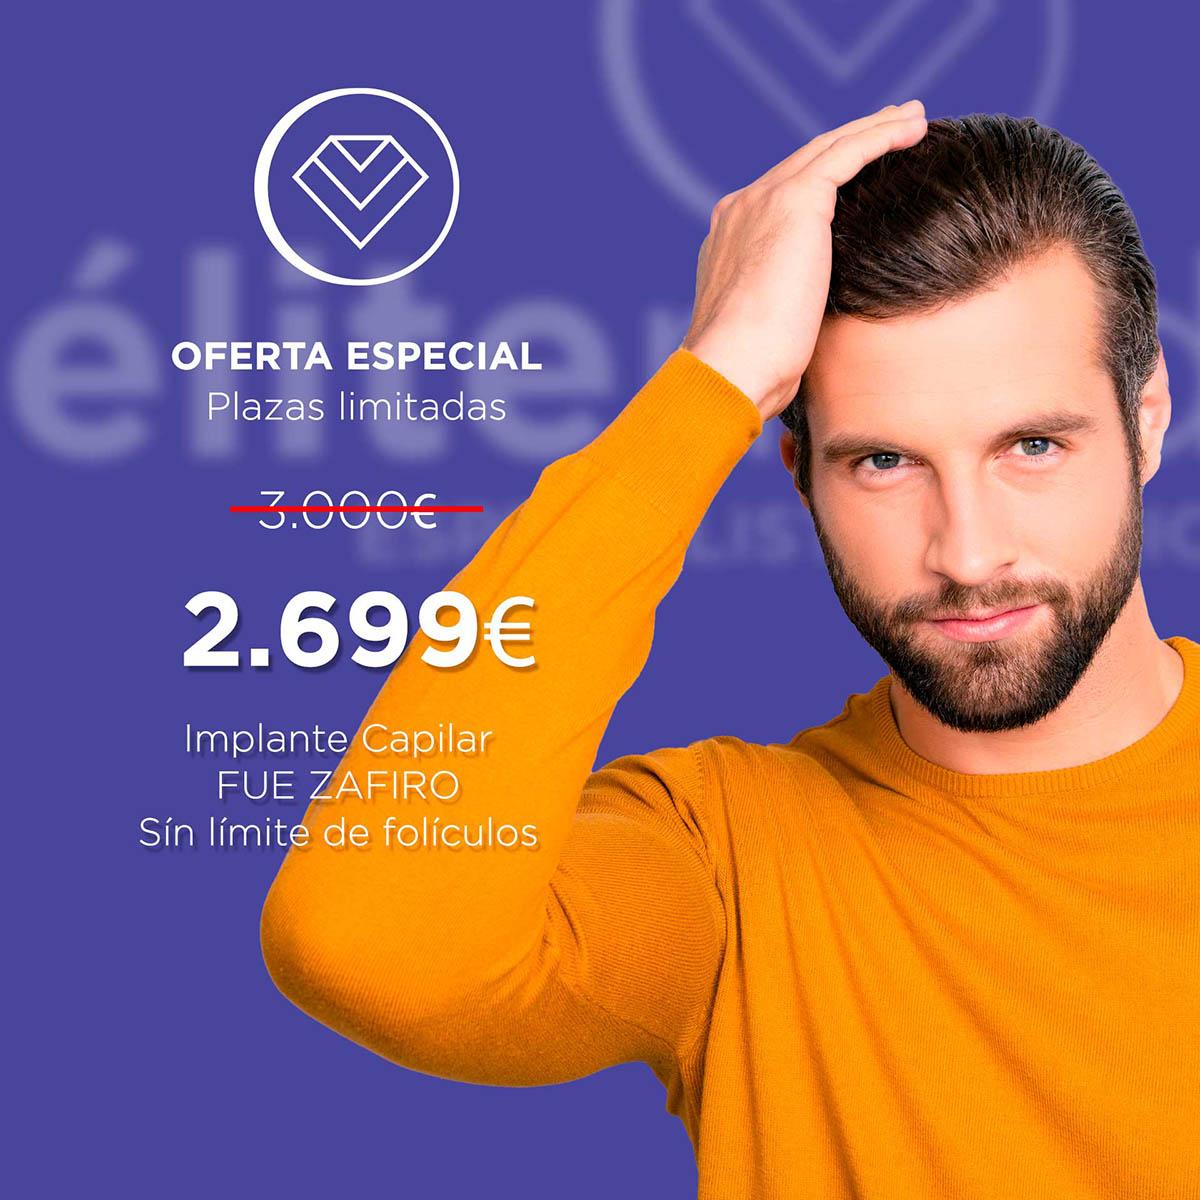 Oferta Implante Capilar FUE Zafiro en Élite Medical Madrid